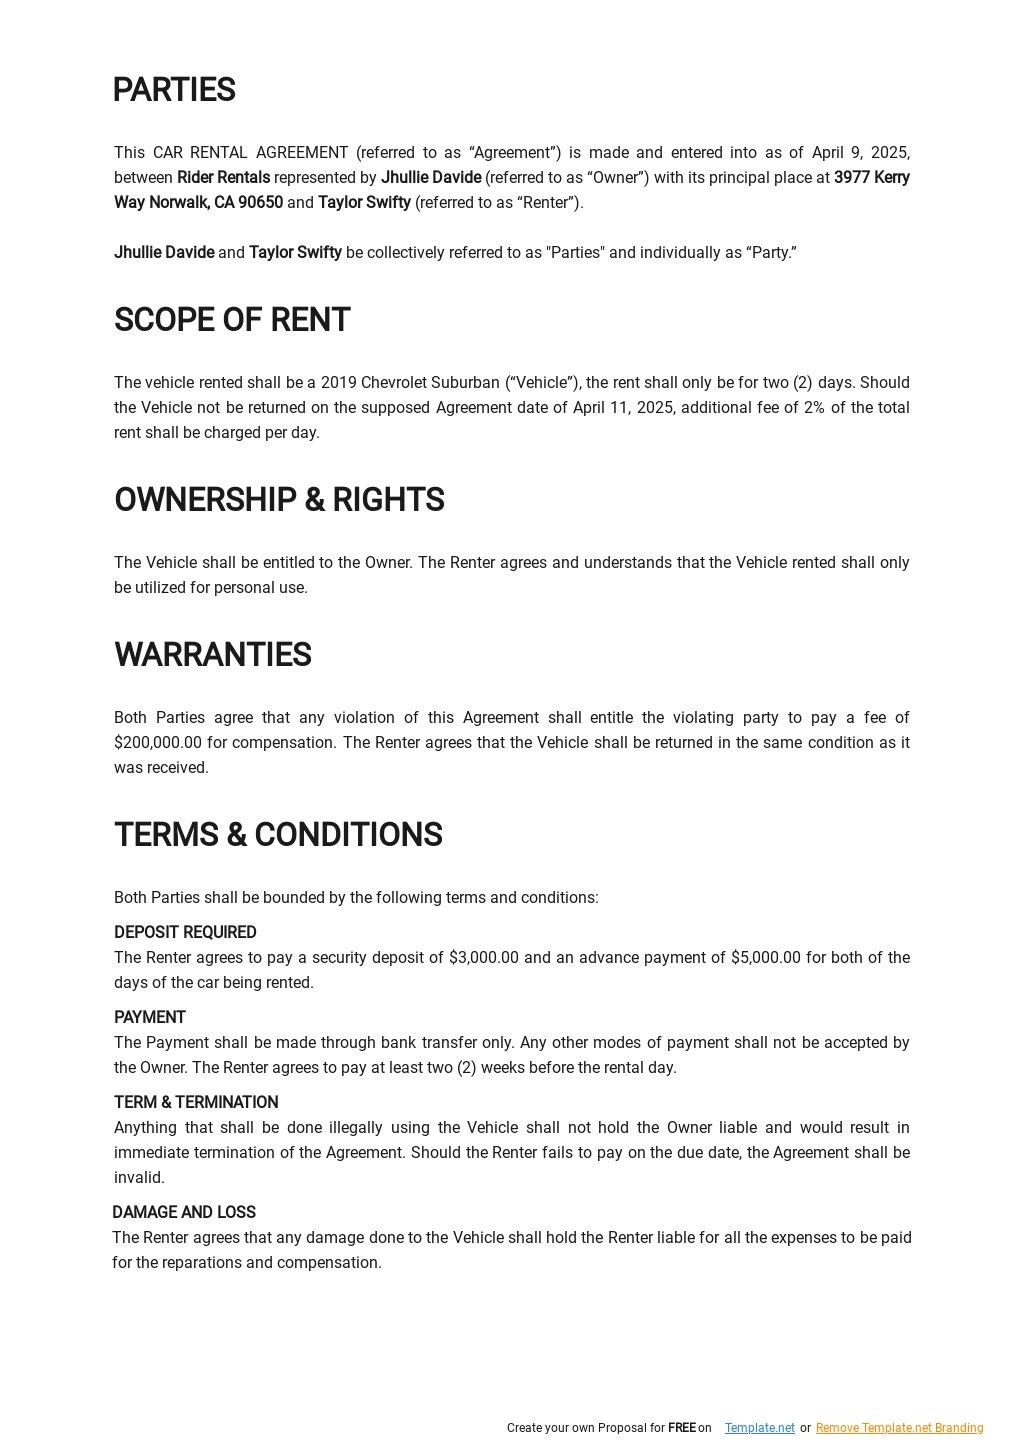 Simple Car Rental Agreement Template 1.jpe